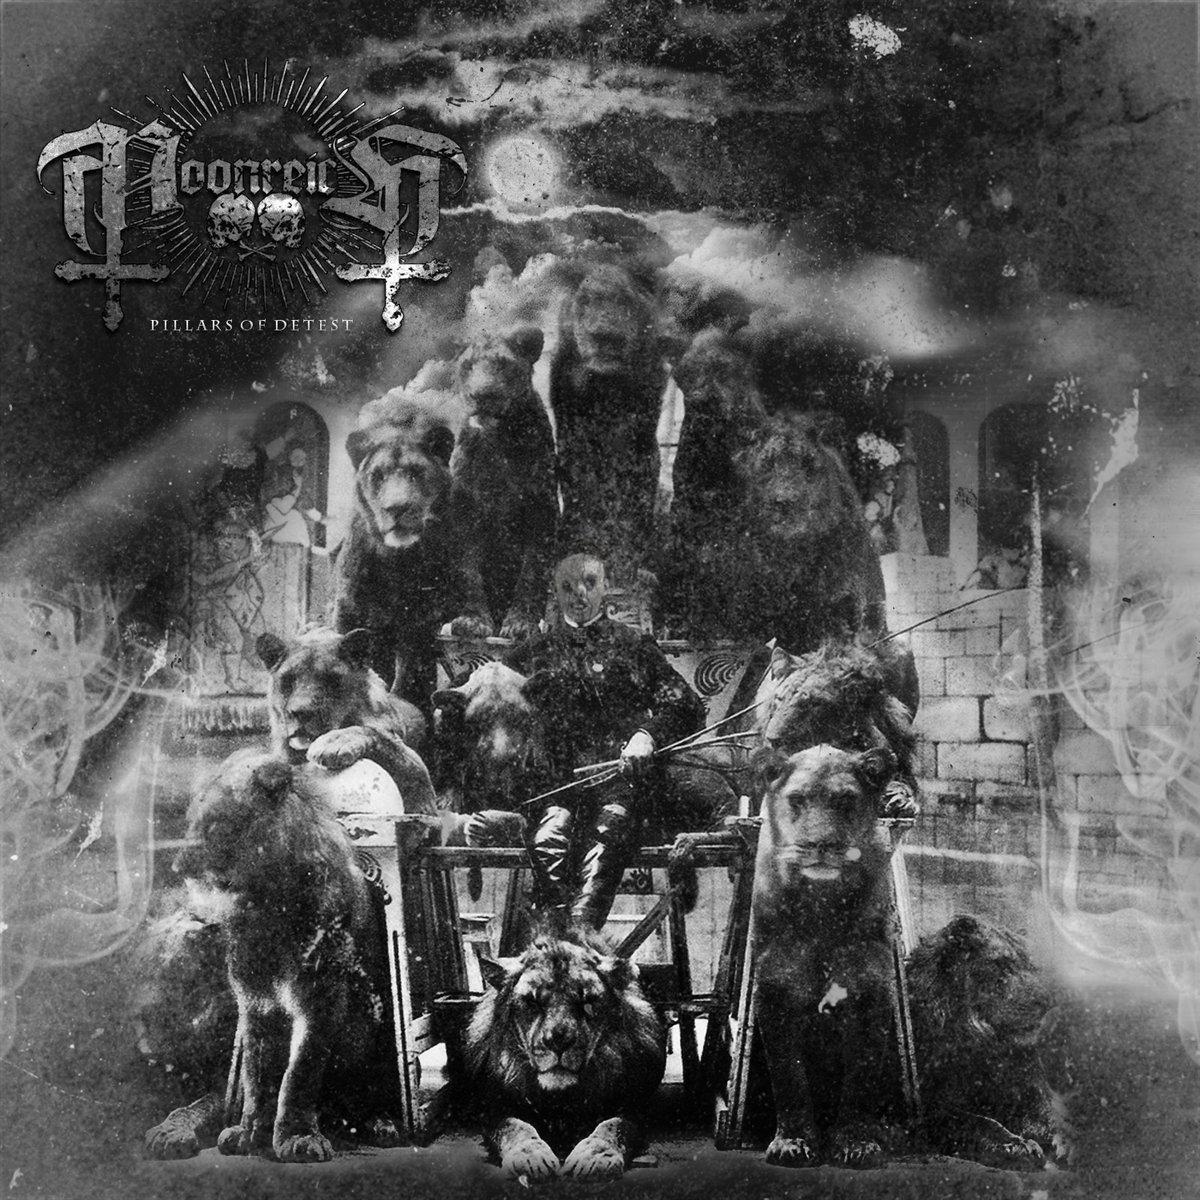 Moonreich - Pillars of Detest